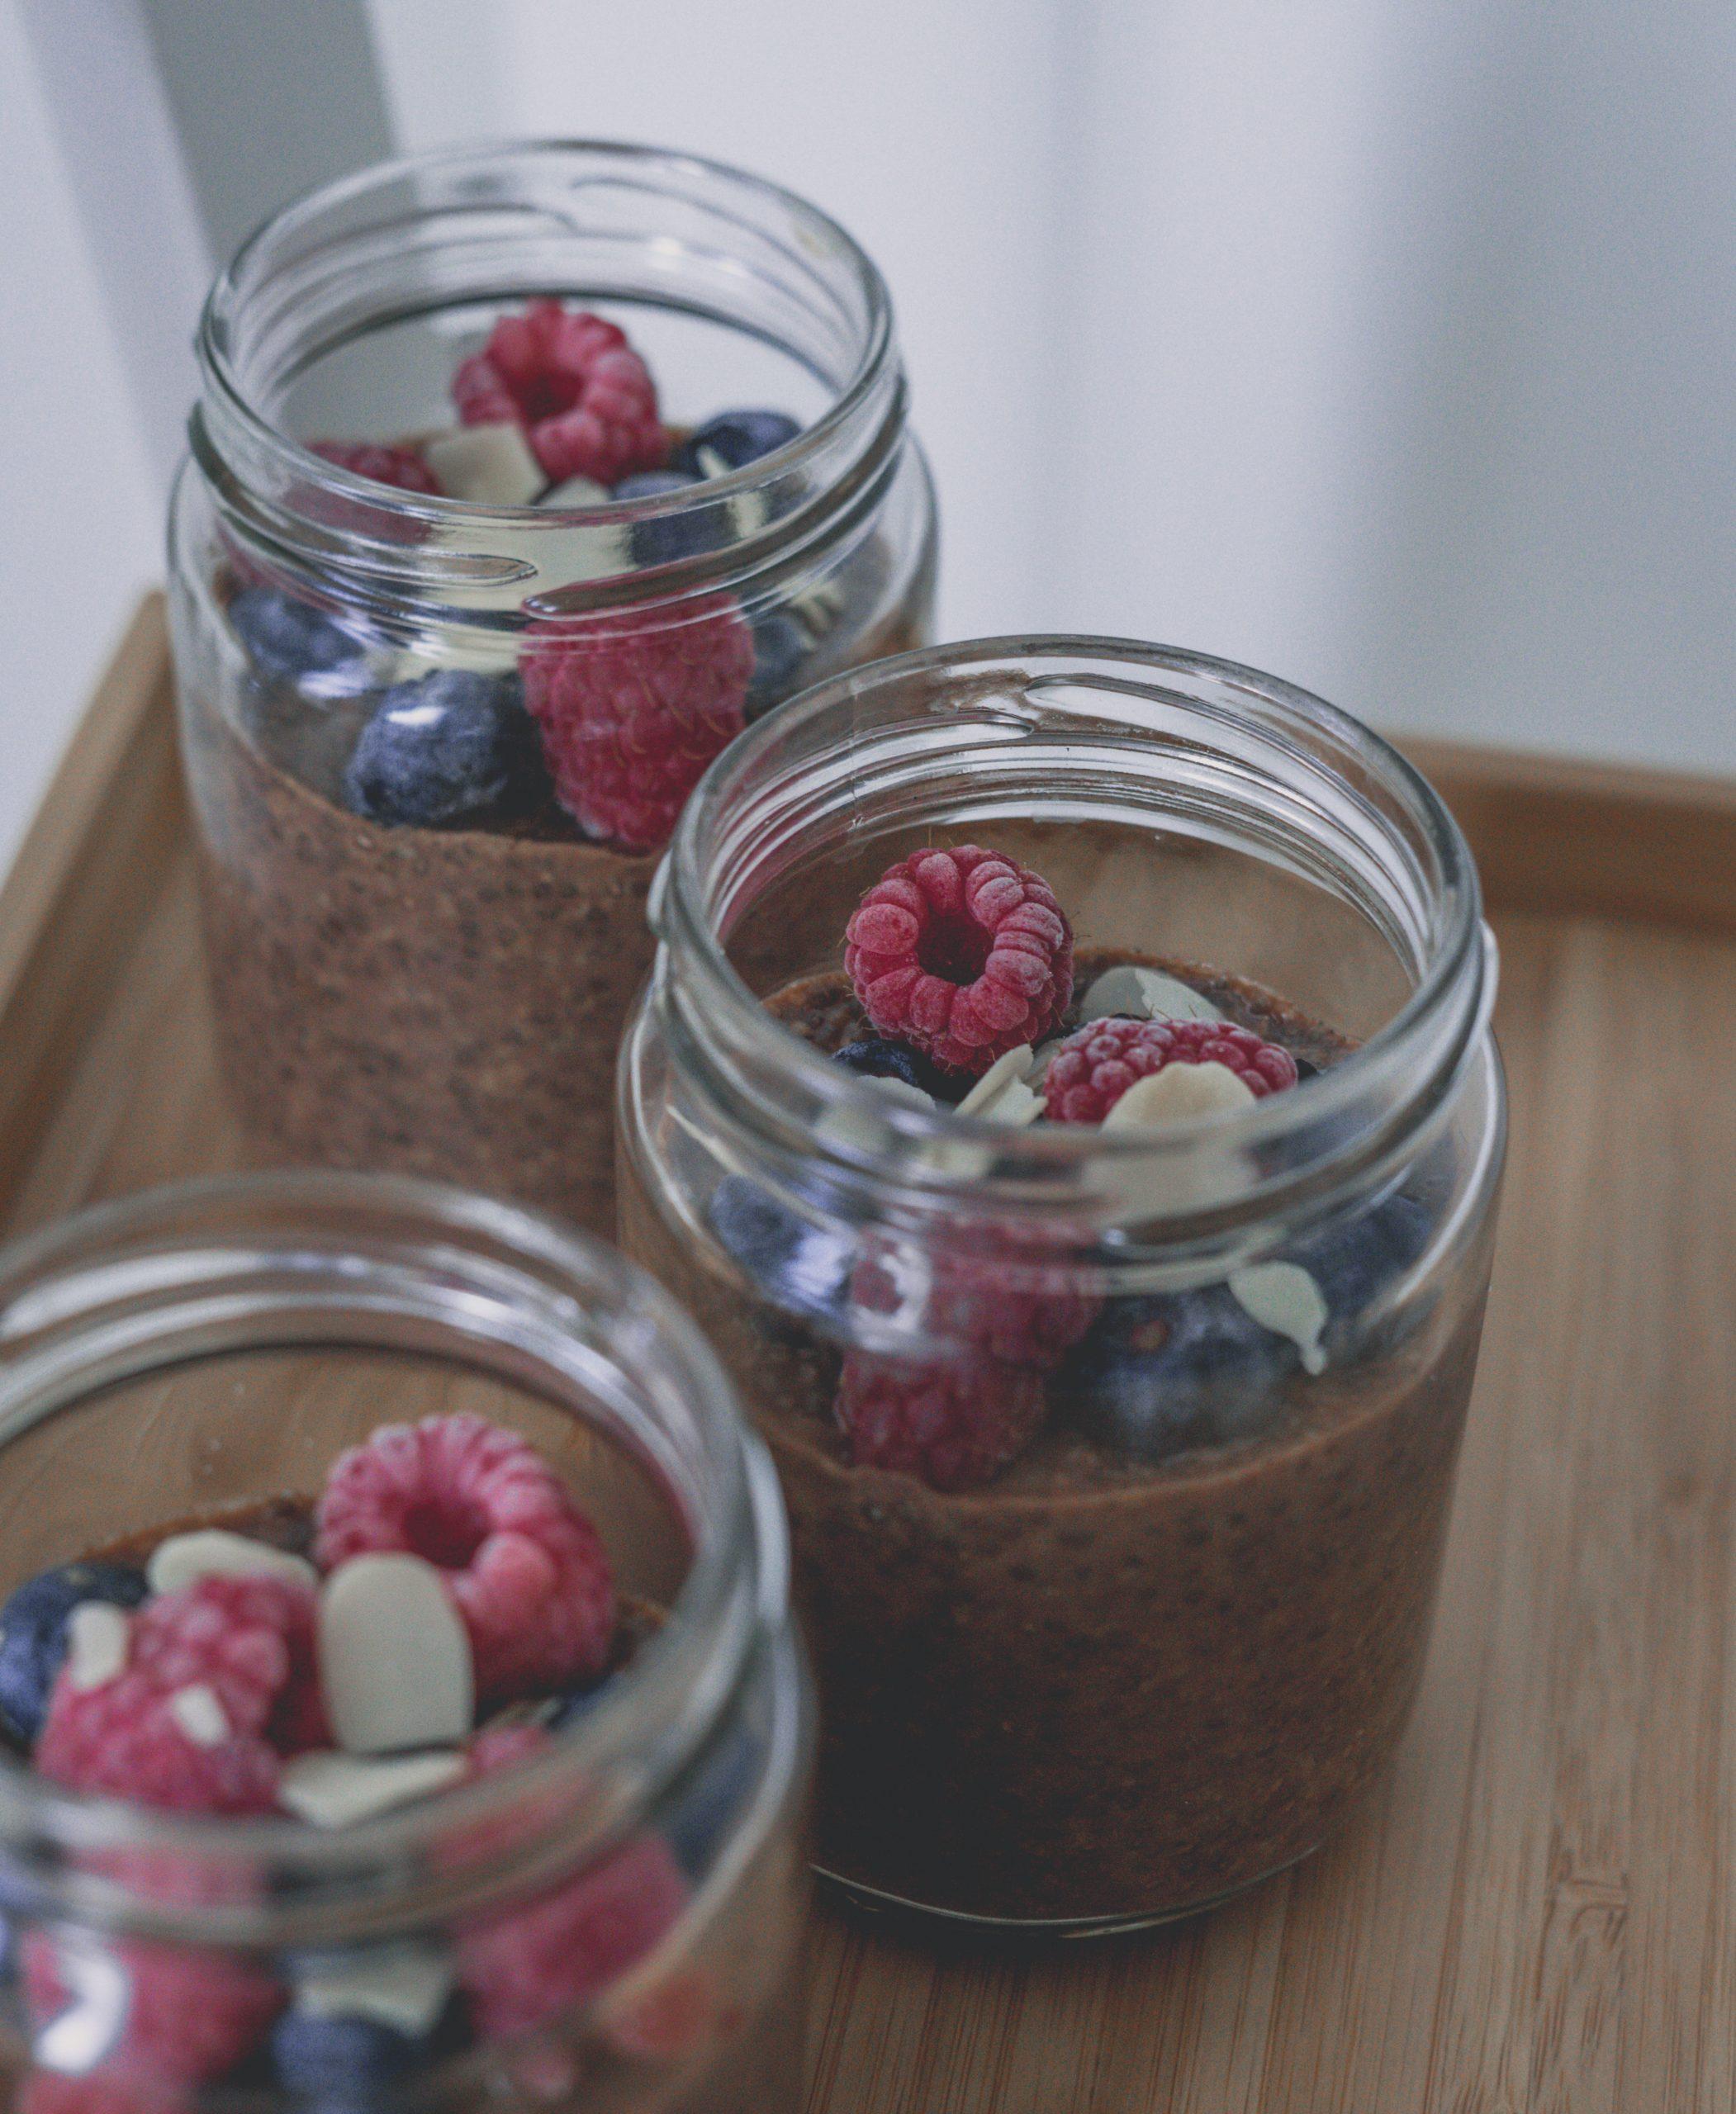 Schokoladen-Erdnuss Chia Pudding